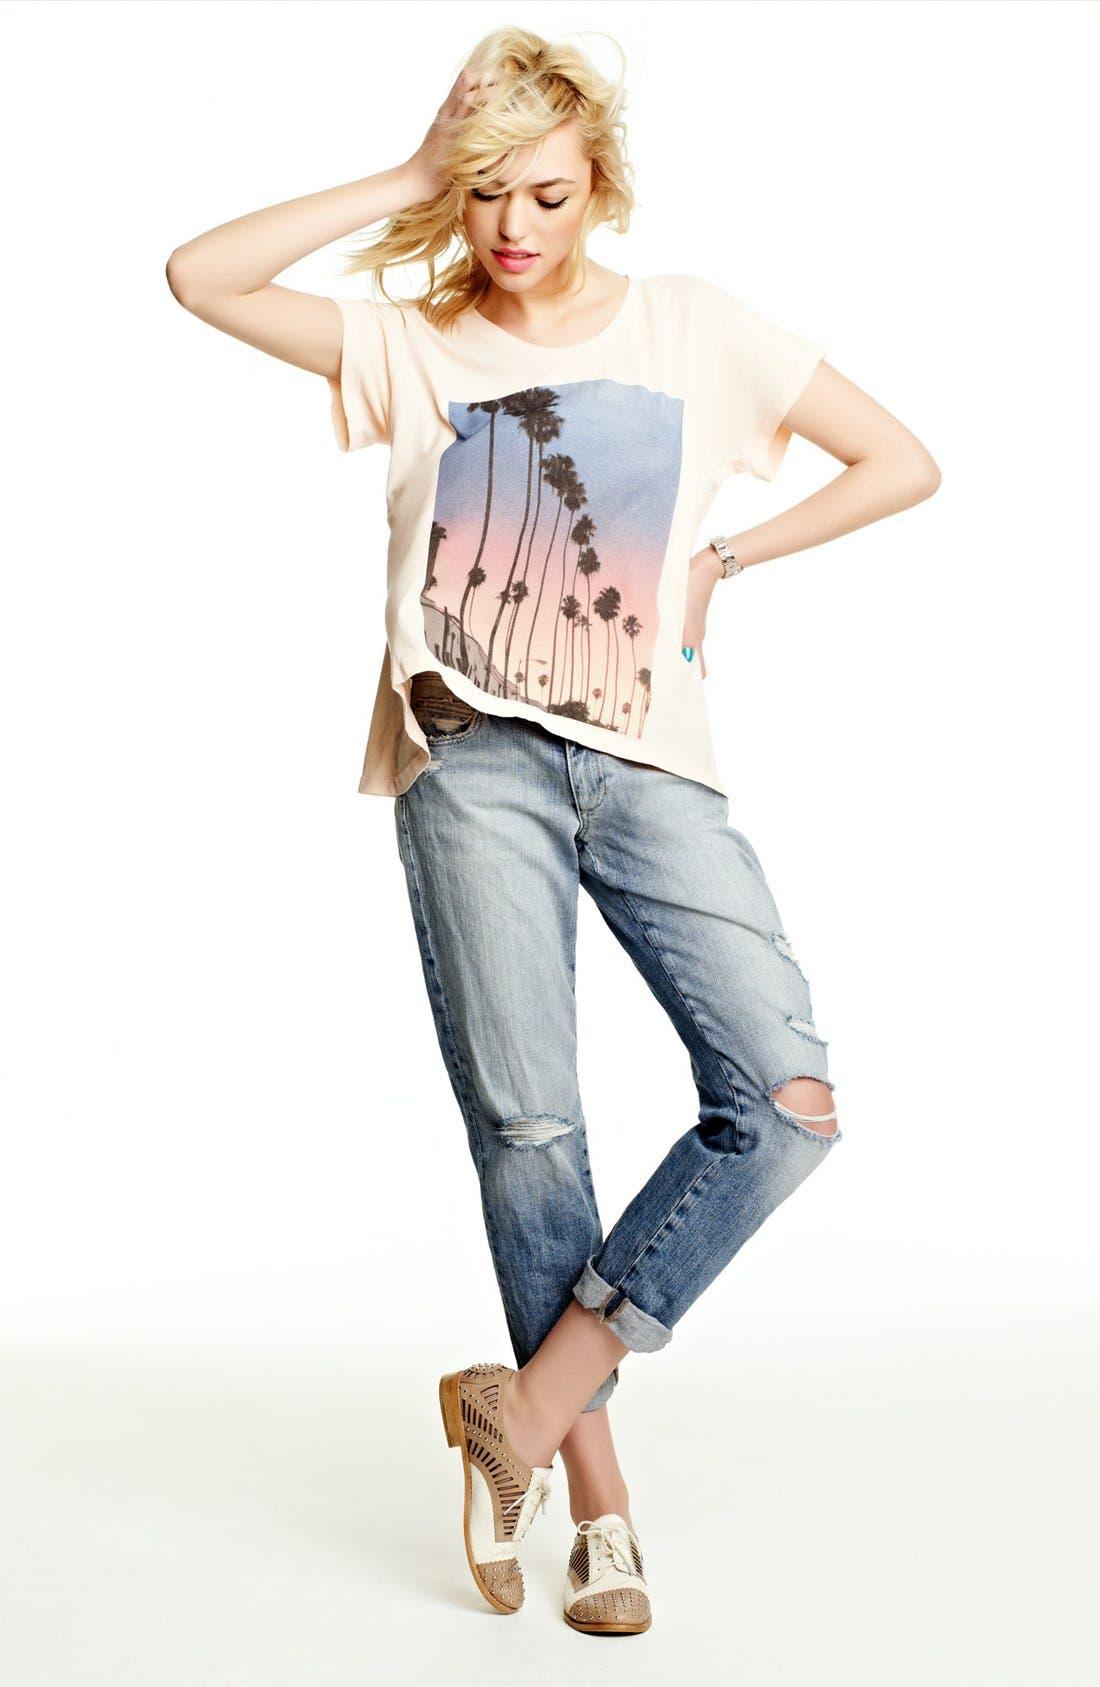 Main Image - Wildfox Tee & Joe's Crop Jeans